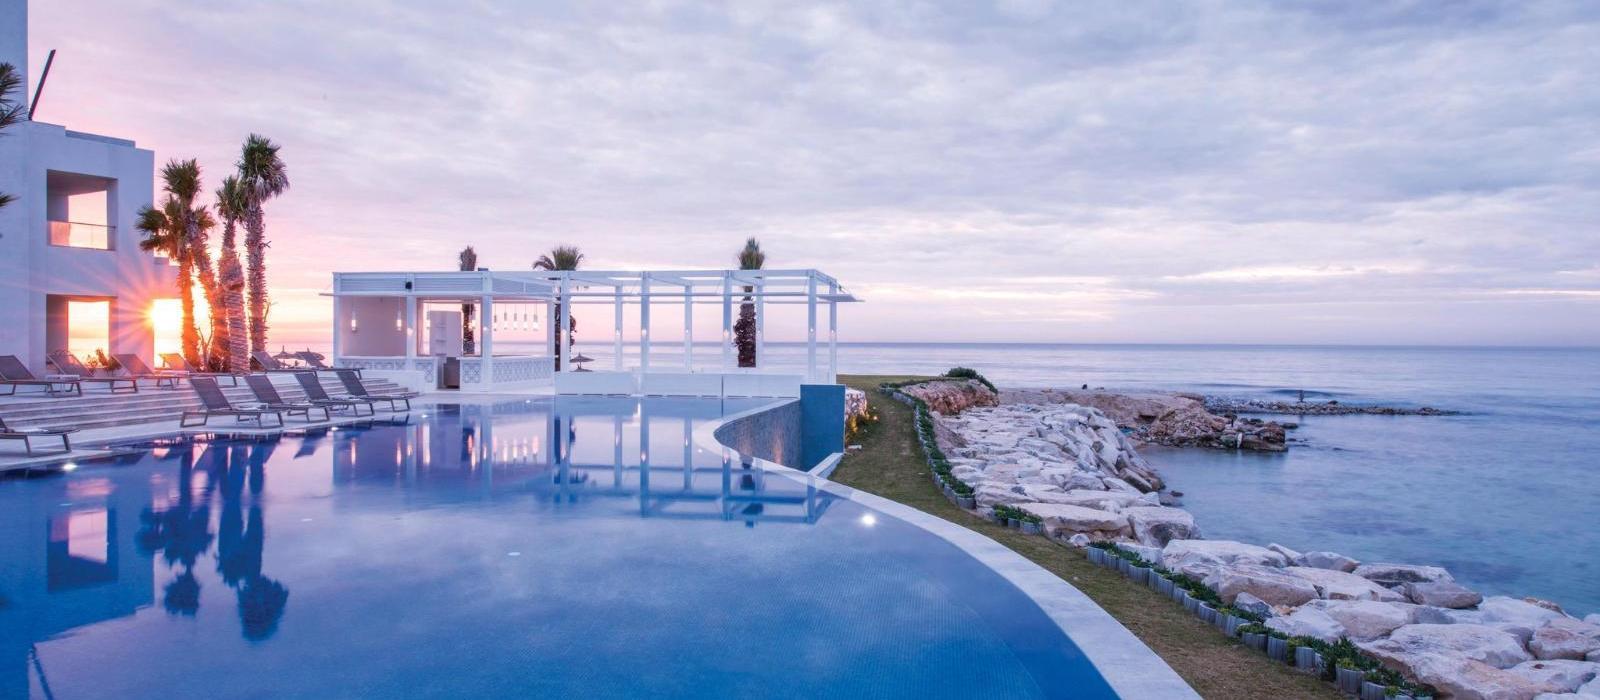 巴迪拉酒店(La Badira) 图片  www.lhw.cn